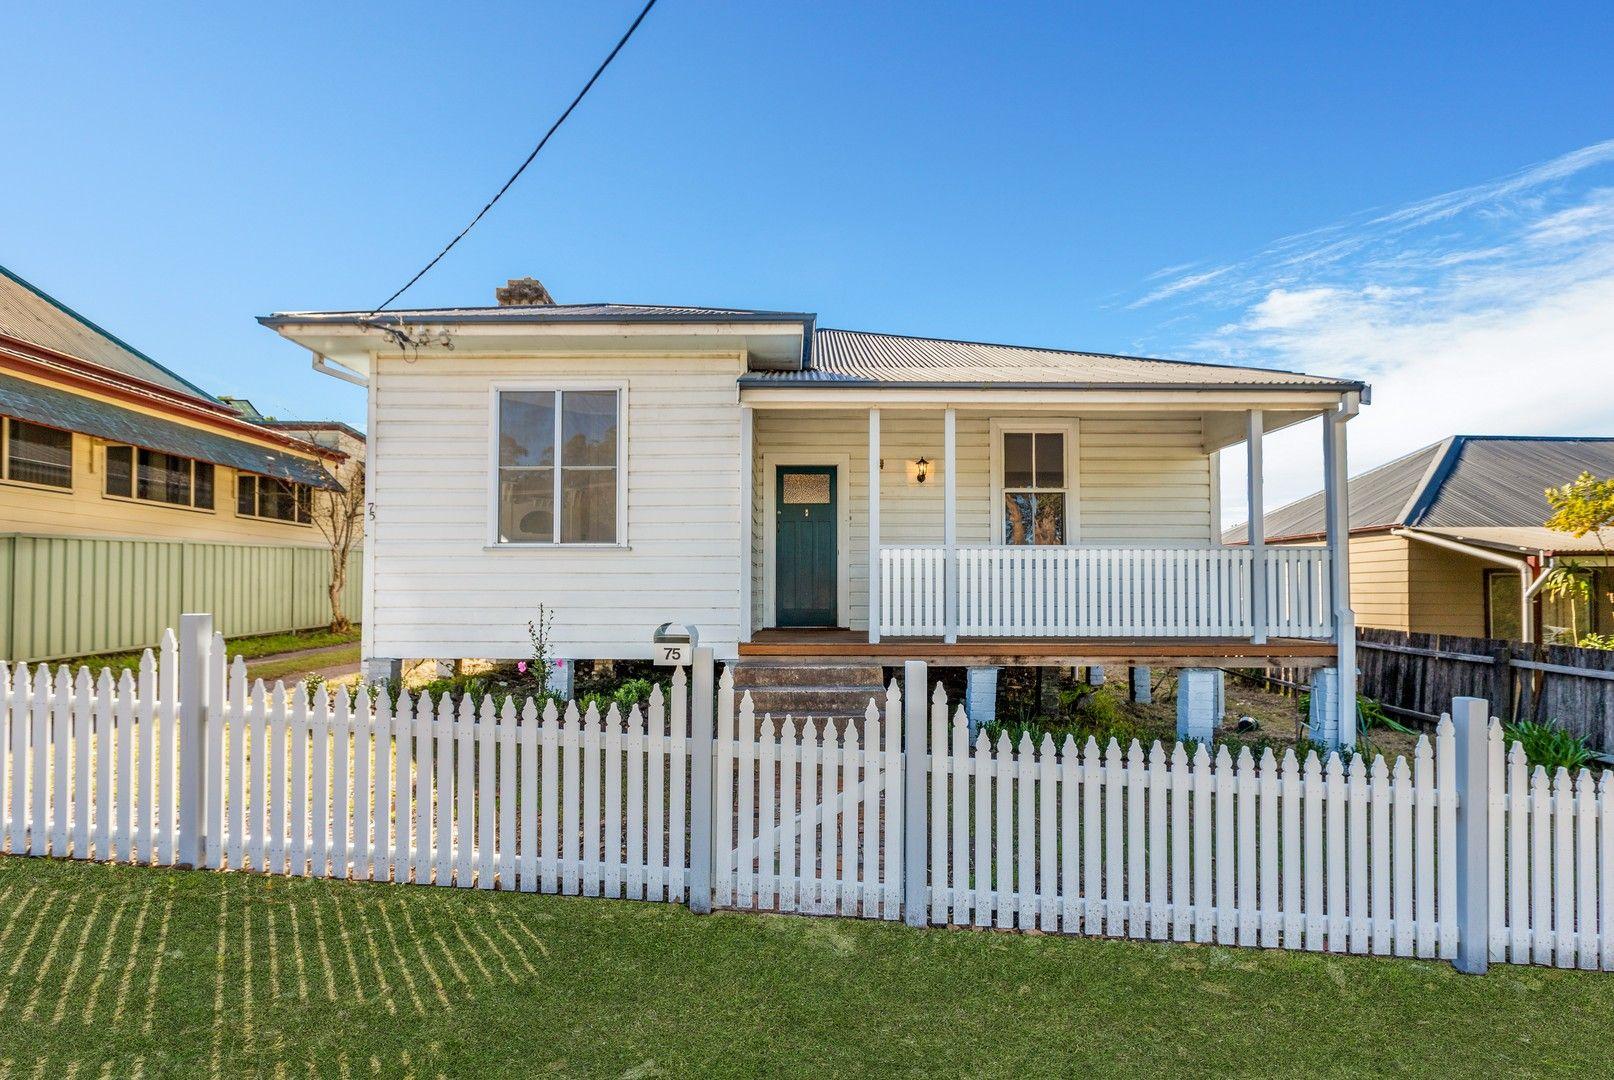 75 Hooke Street, Dungog NSW 2420, Image 0